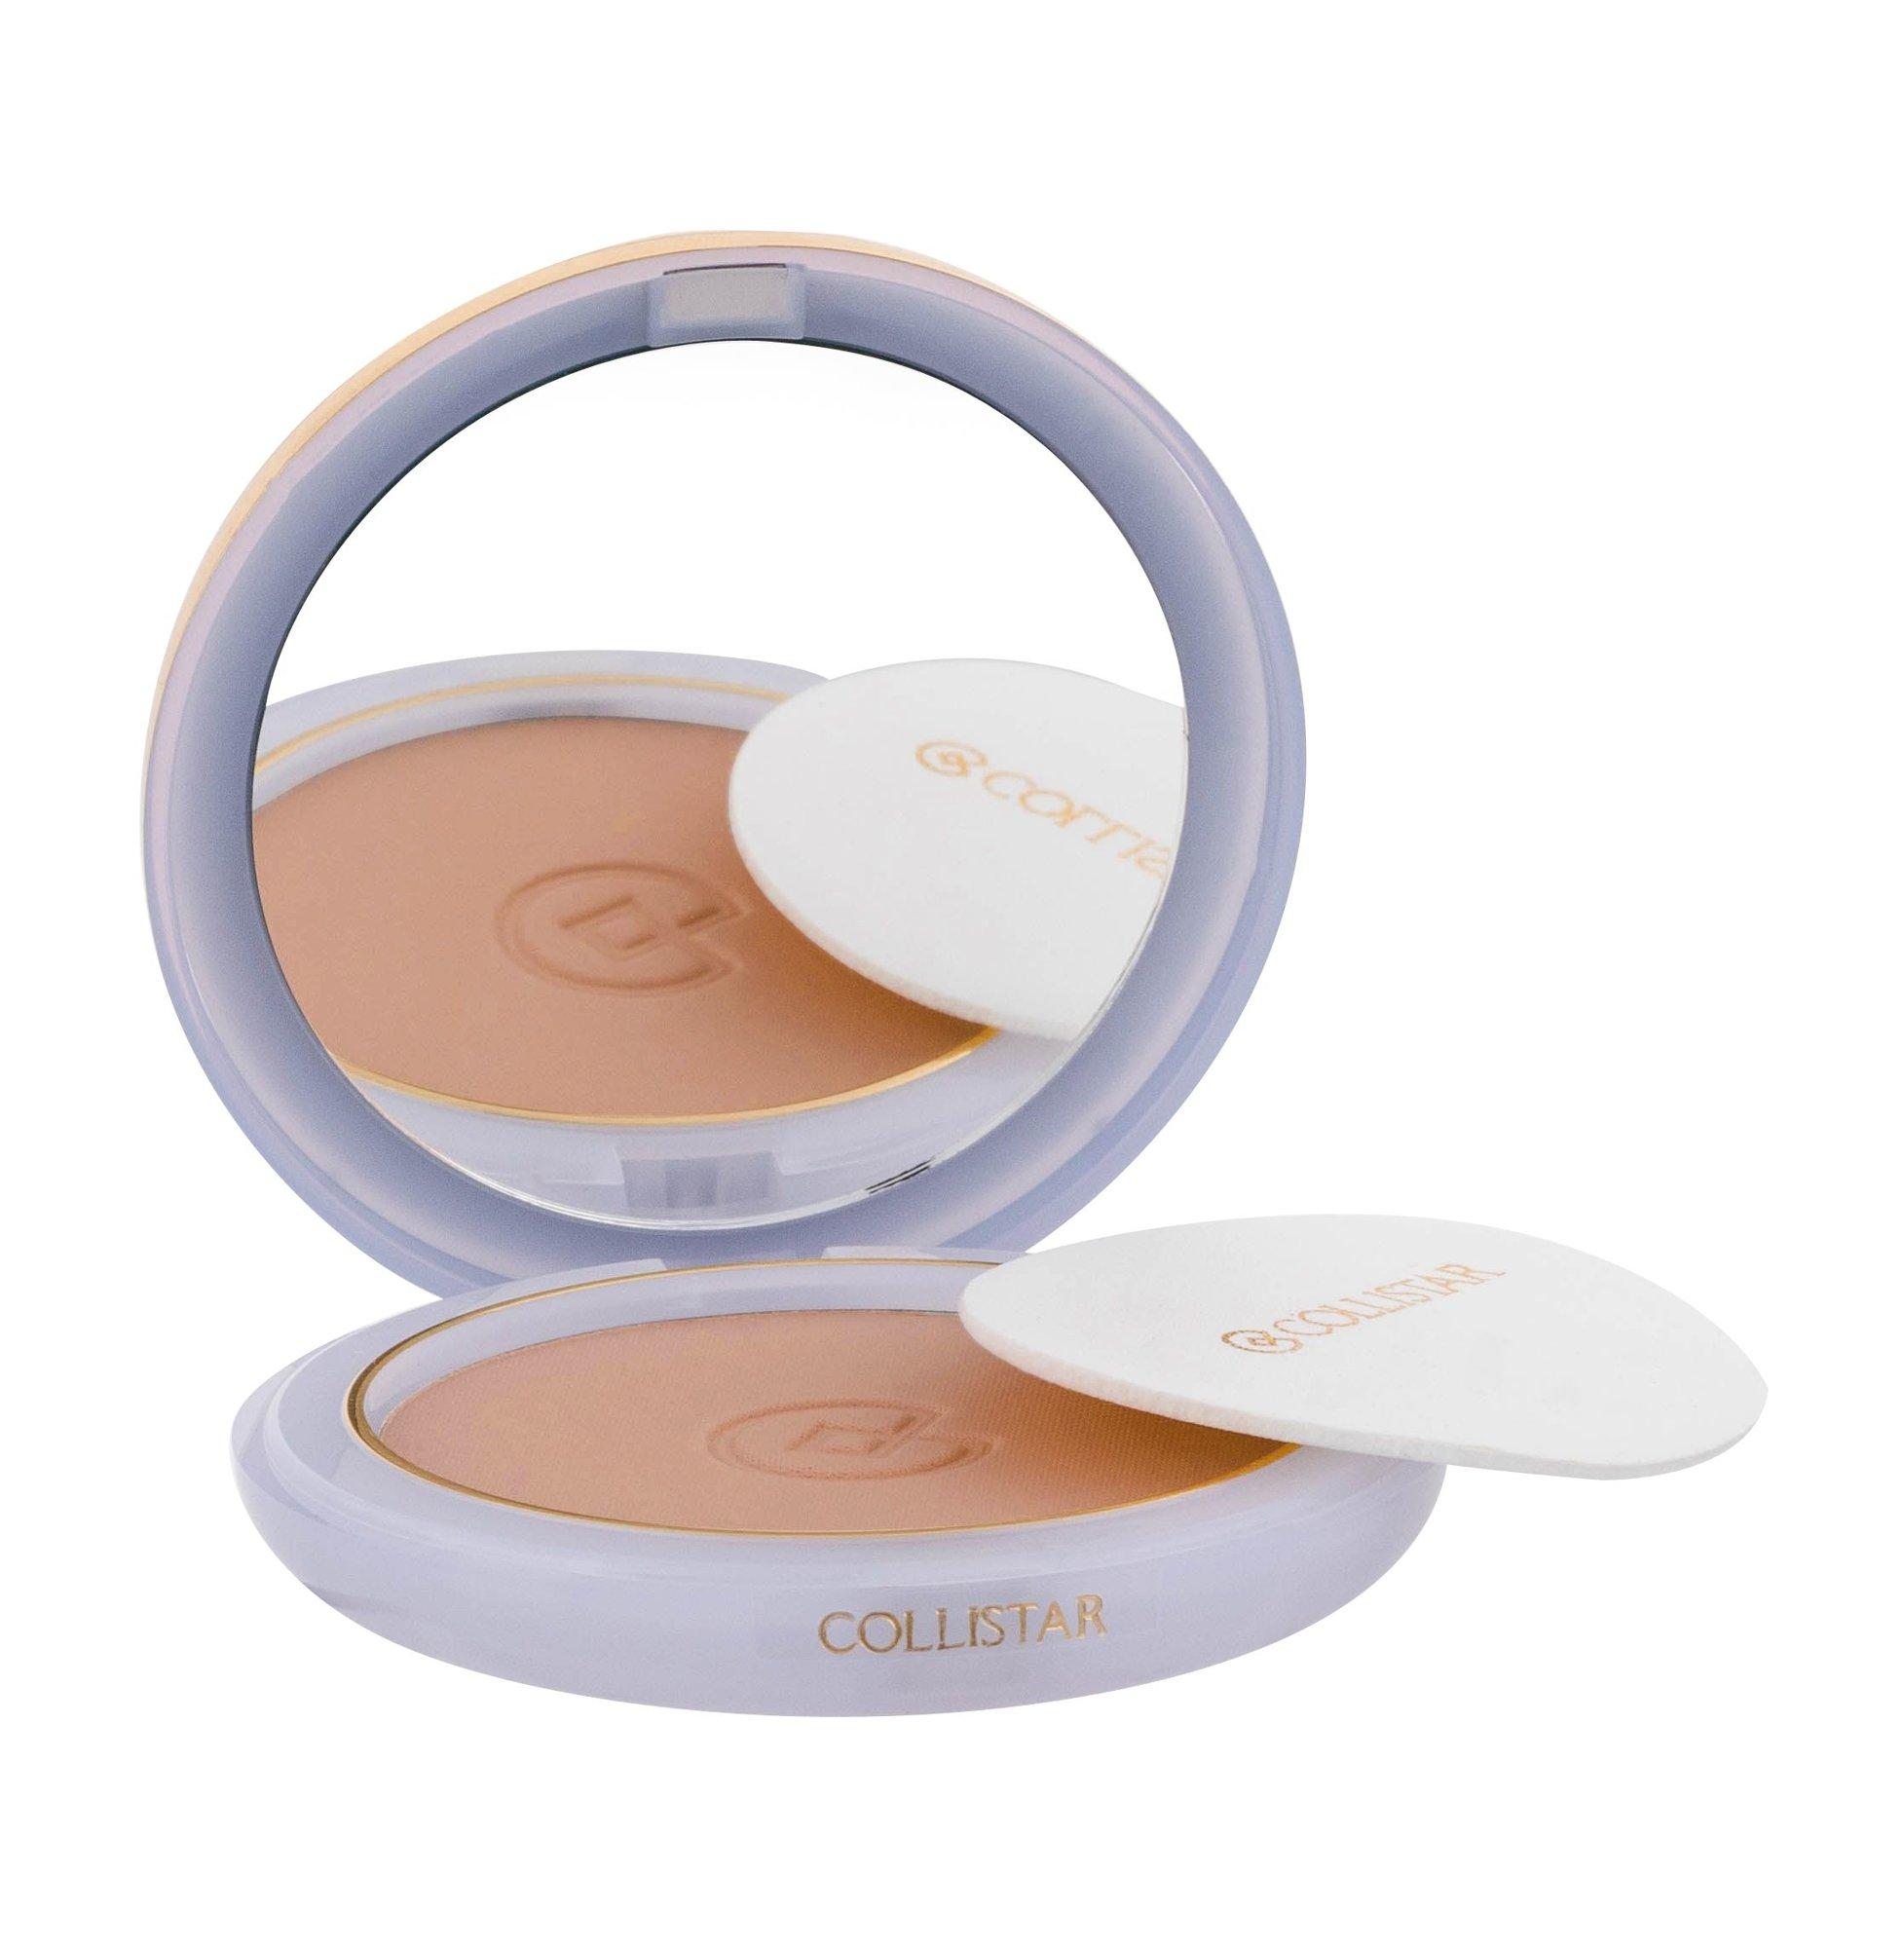 Collistar Silk Effect Compact Powder Cosmetic 7ml 4 Cappuccino